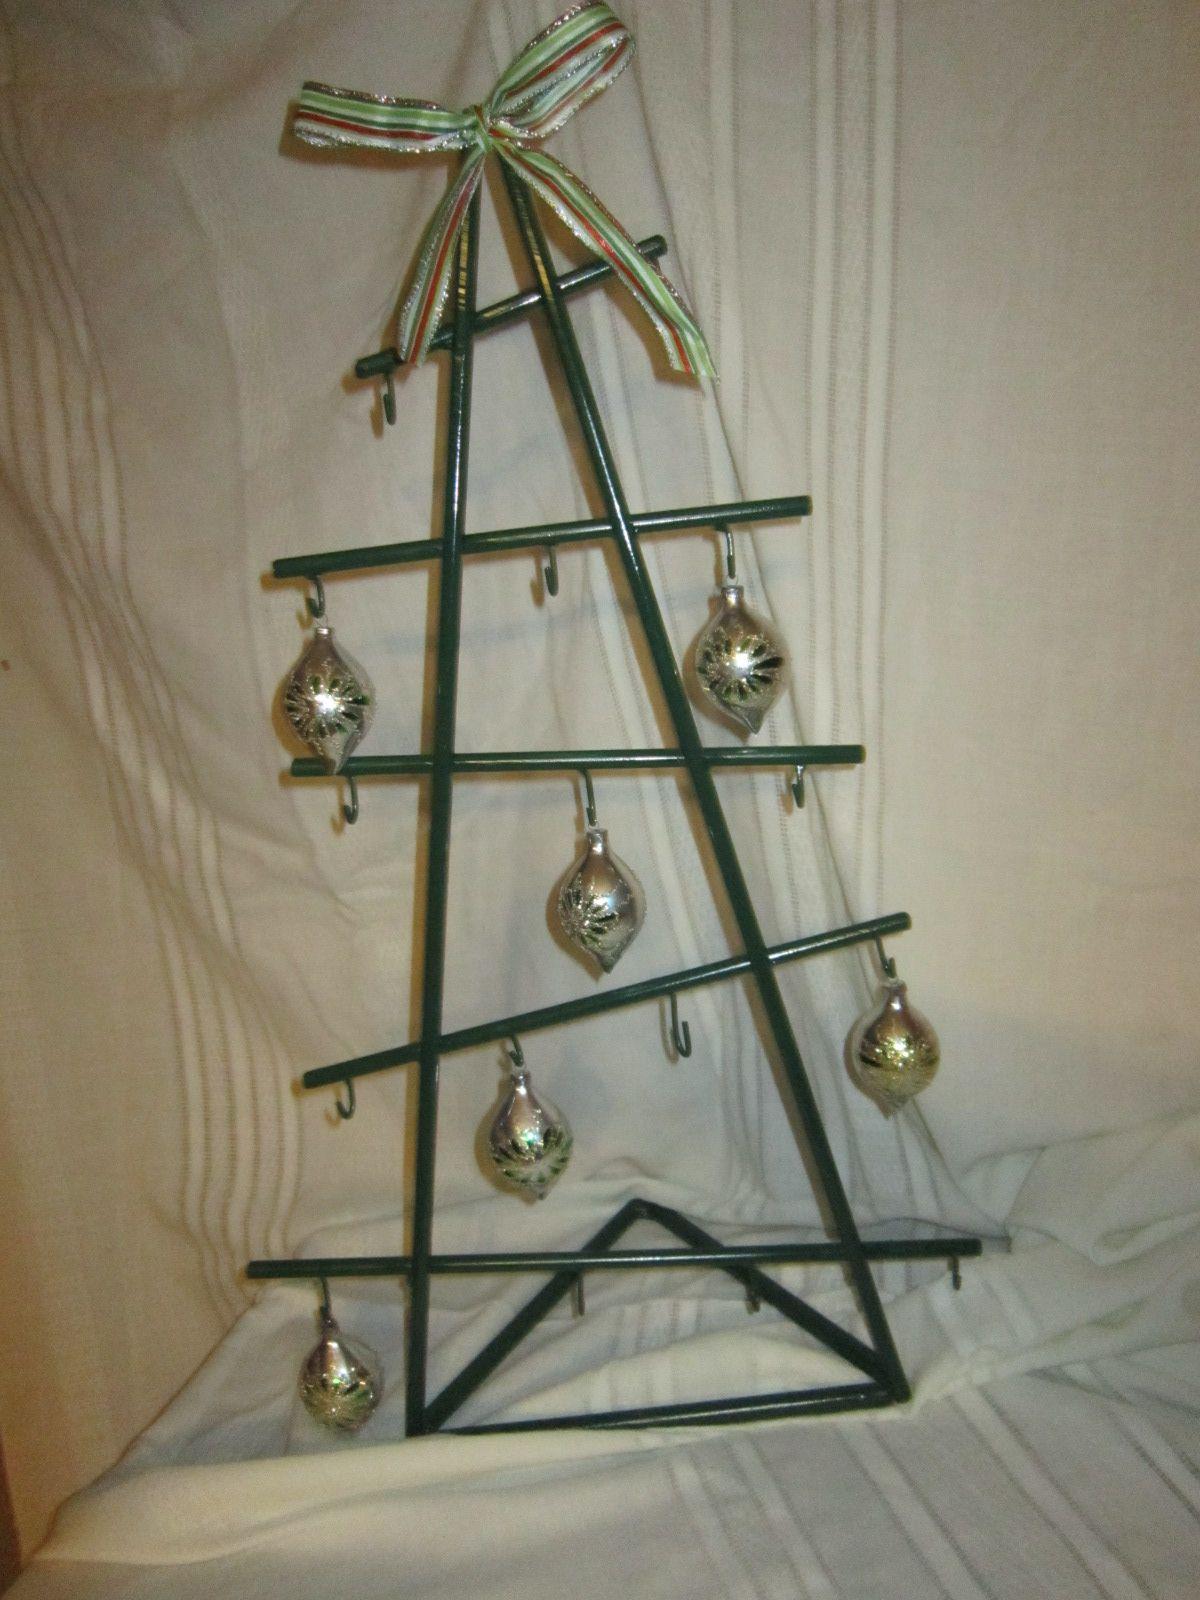 Wrought Iron Christmas Tree Ornament Holder From Pergram Iron Works Via Etsy